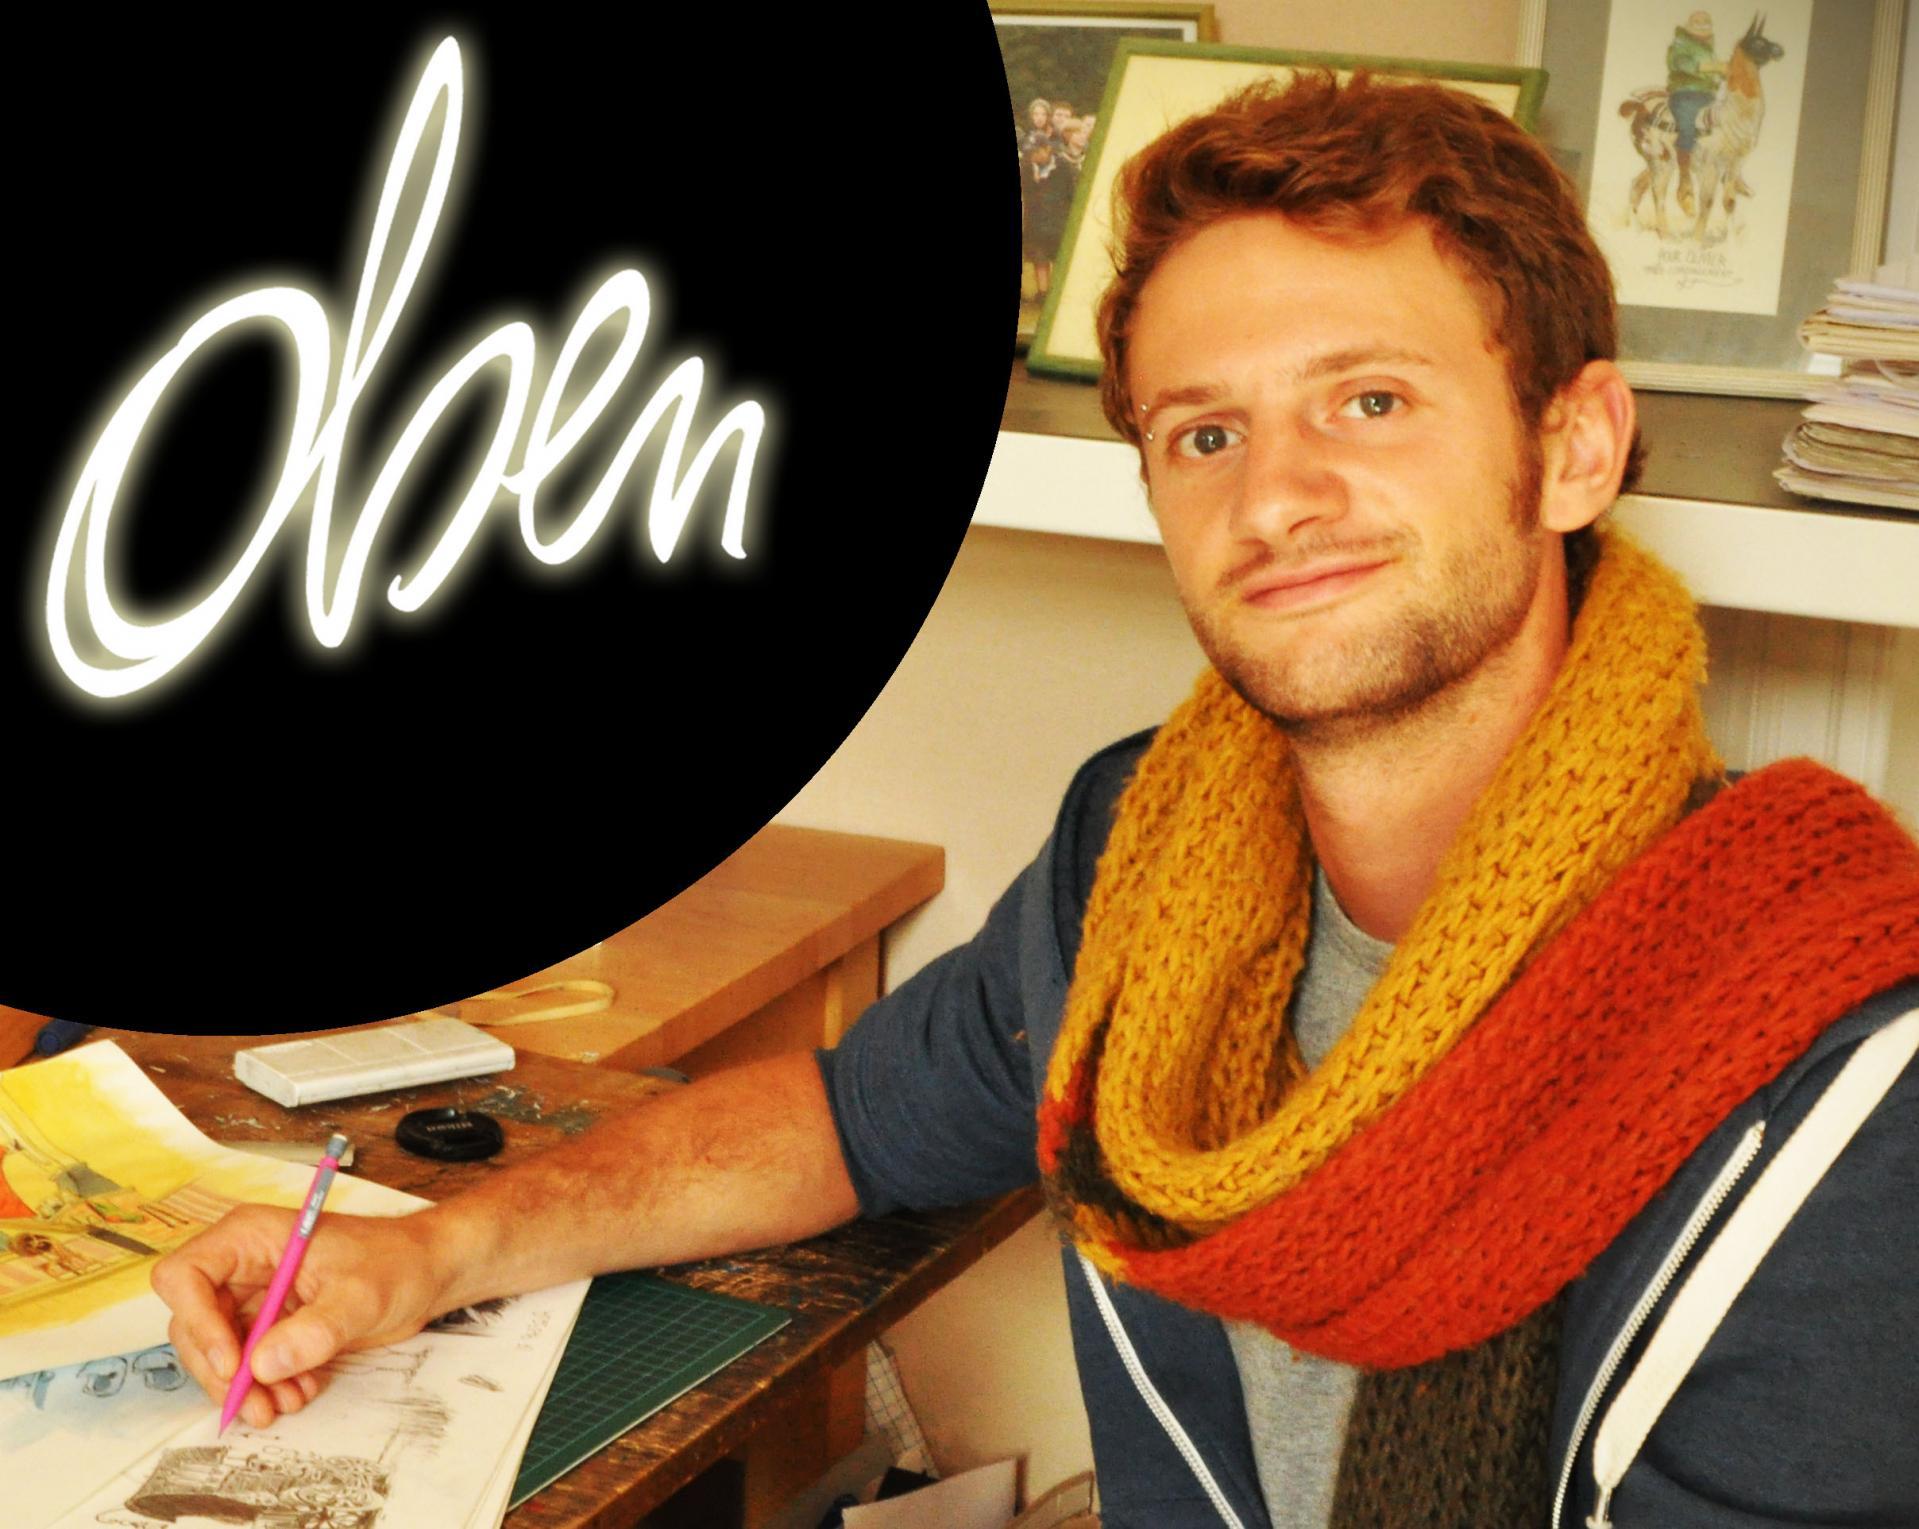 Hi, I'm Olsen!